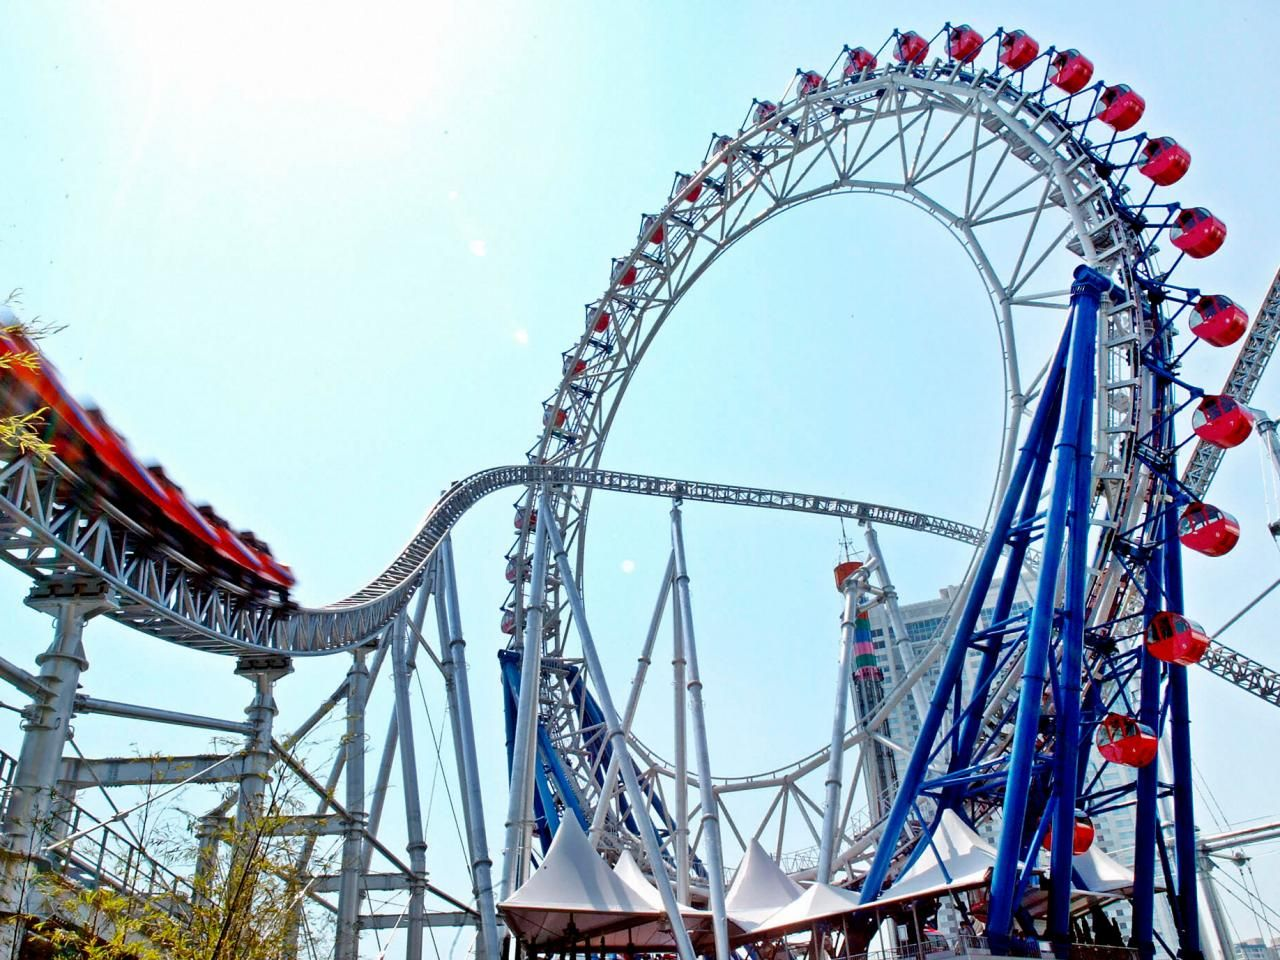 Crazy Roller Coasters TravelChannelcom Crazy Roller Coaster - Pedal powered skycycle rollercoaster japan amazing